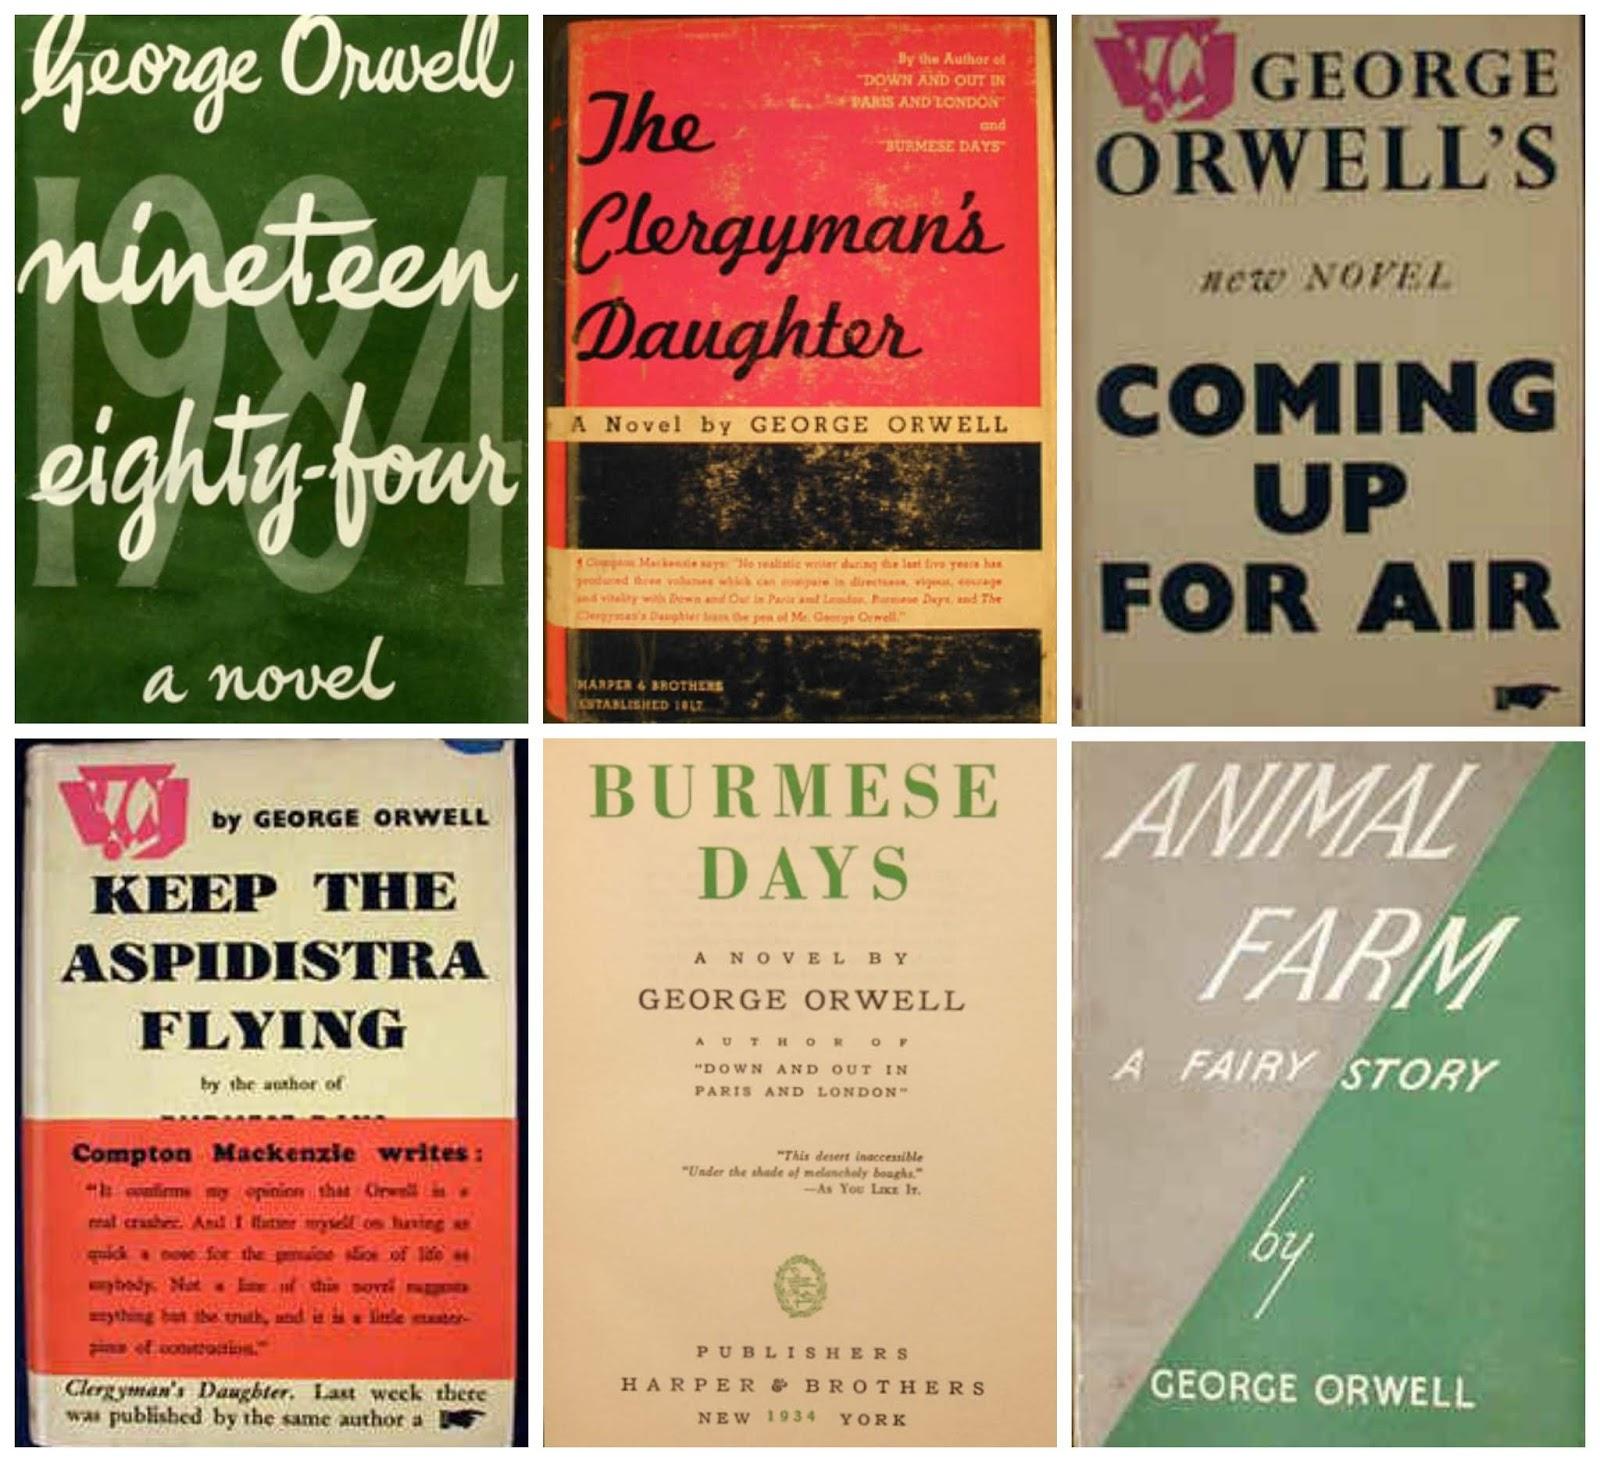 Bookyards: Ebooks by George Orwell